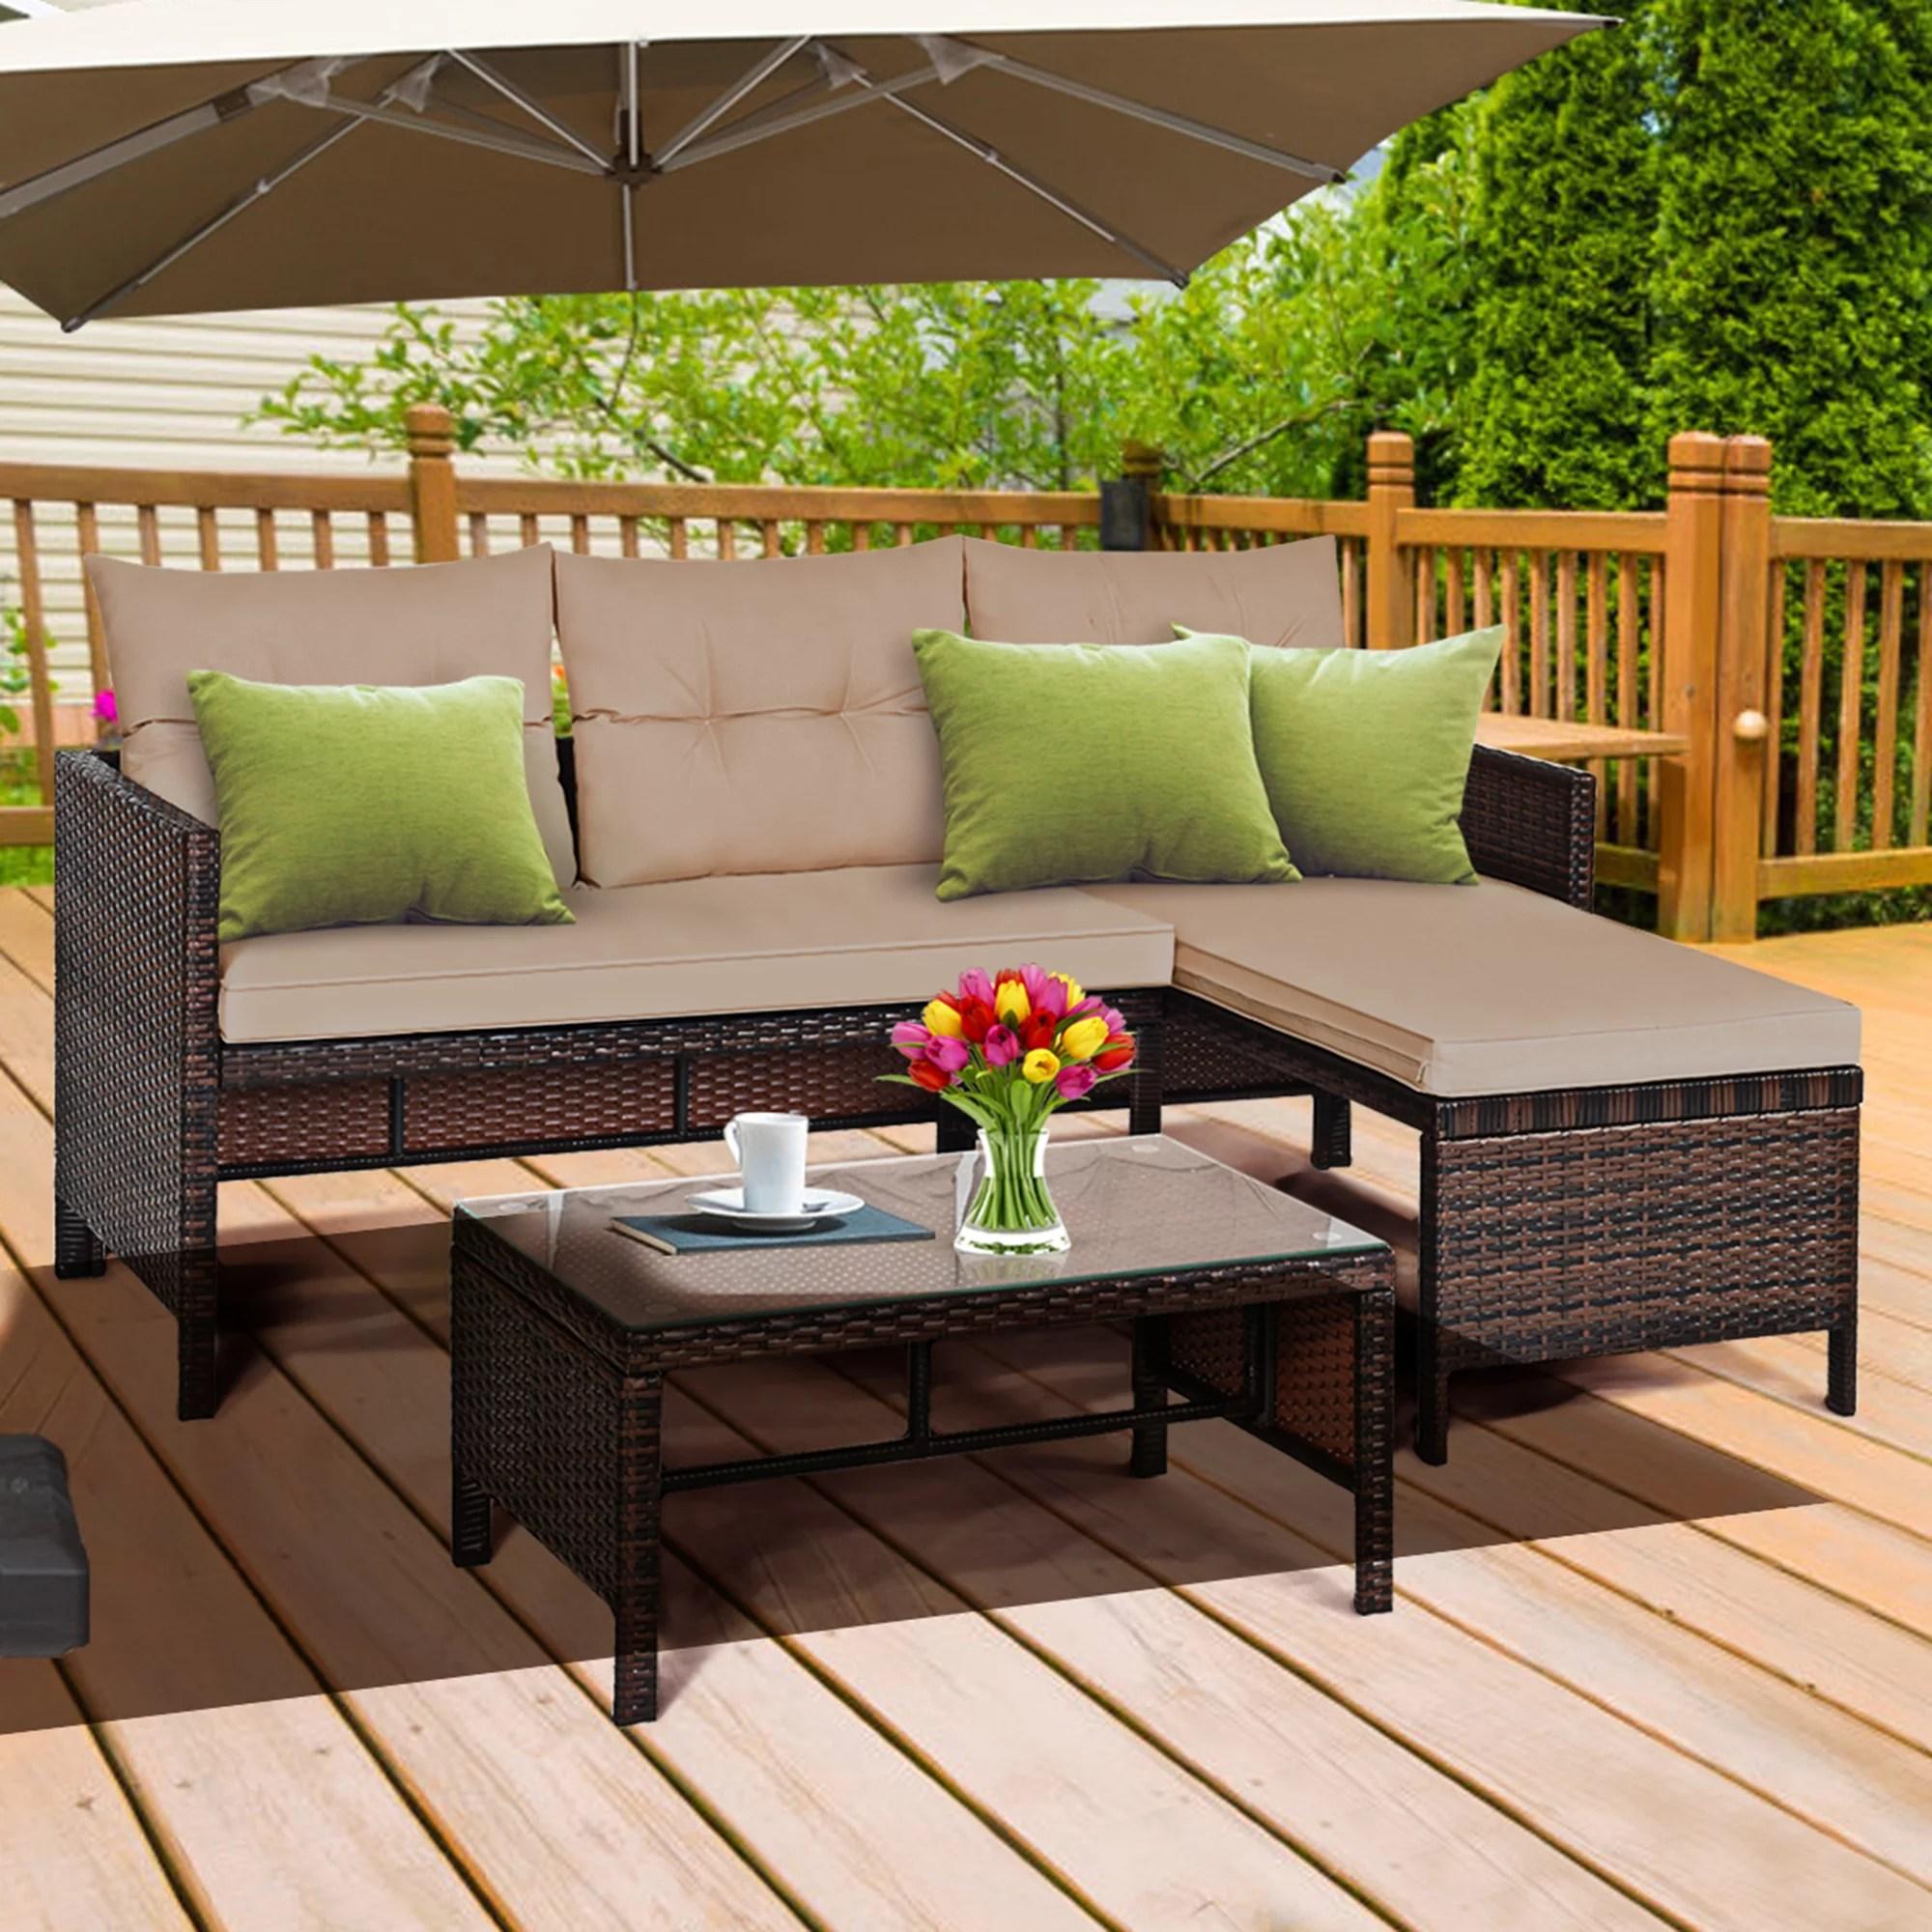 gymax 3pcs outdoor rattan furniture set patio couch sofa set w coffee table walmart com